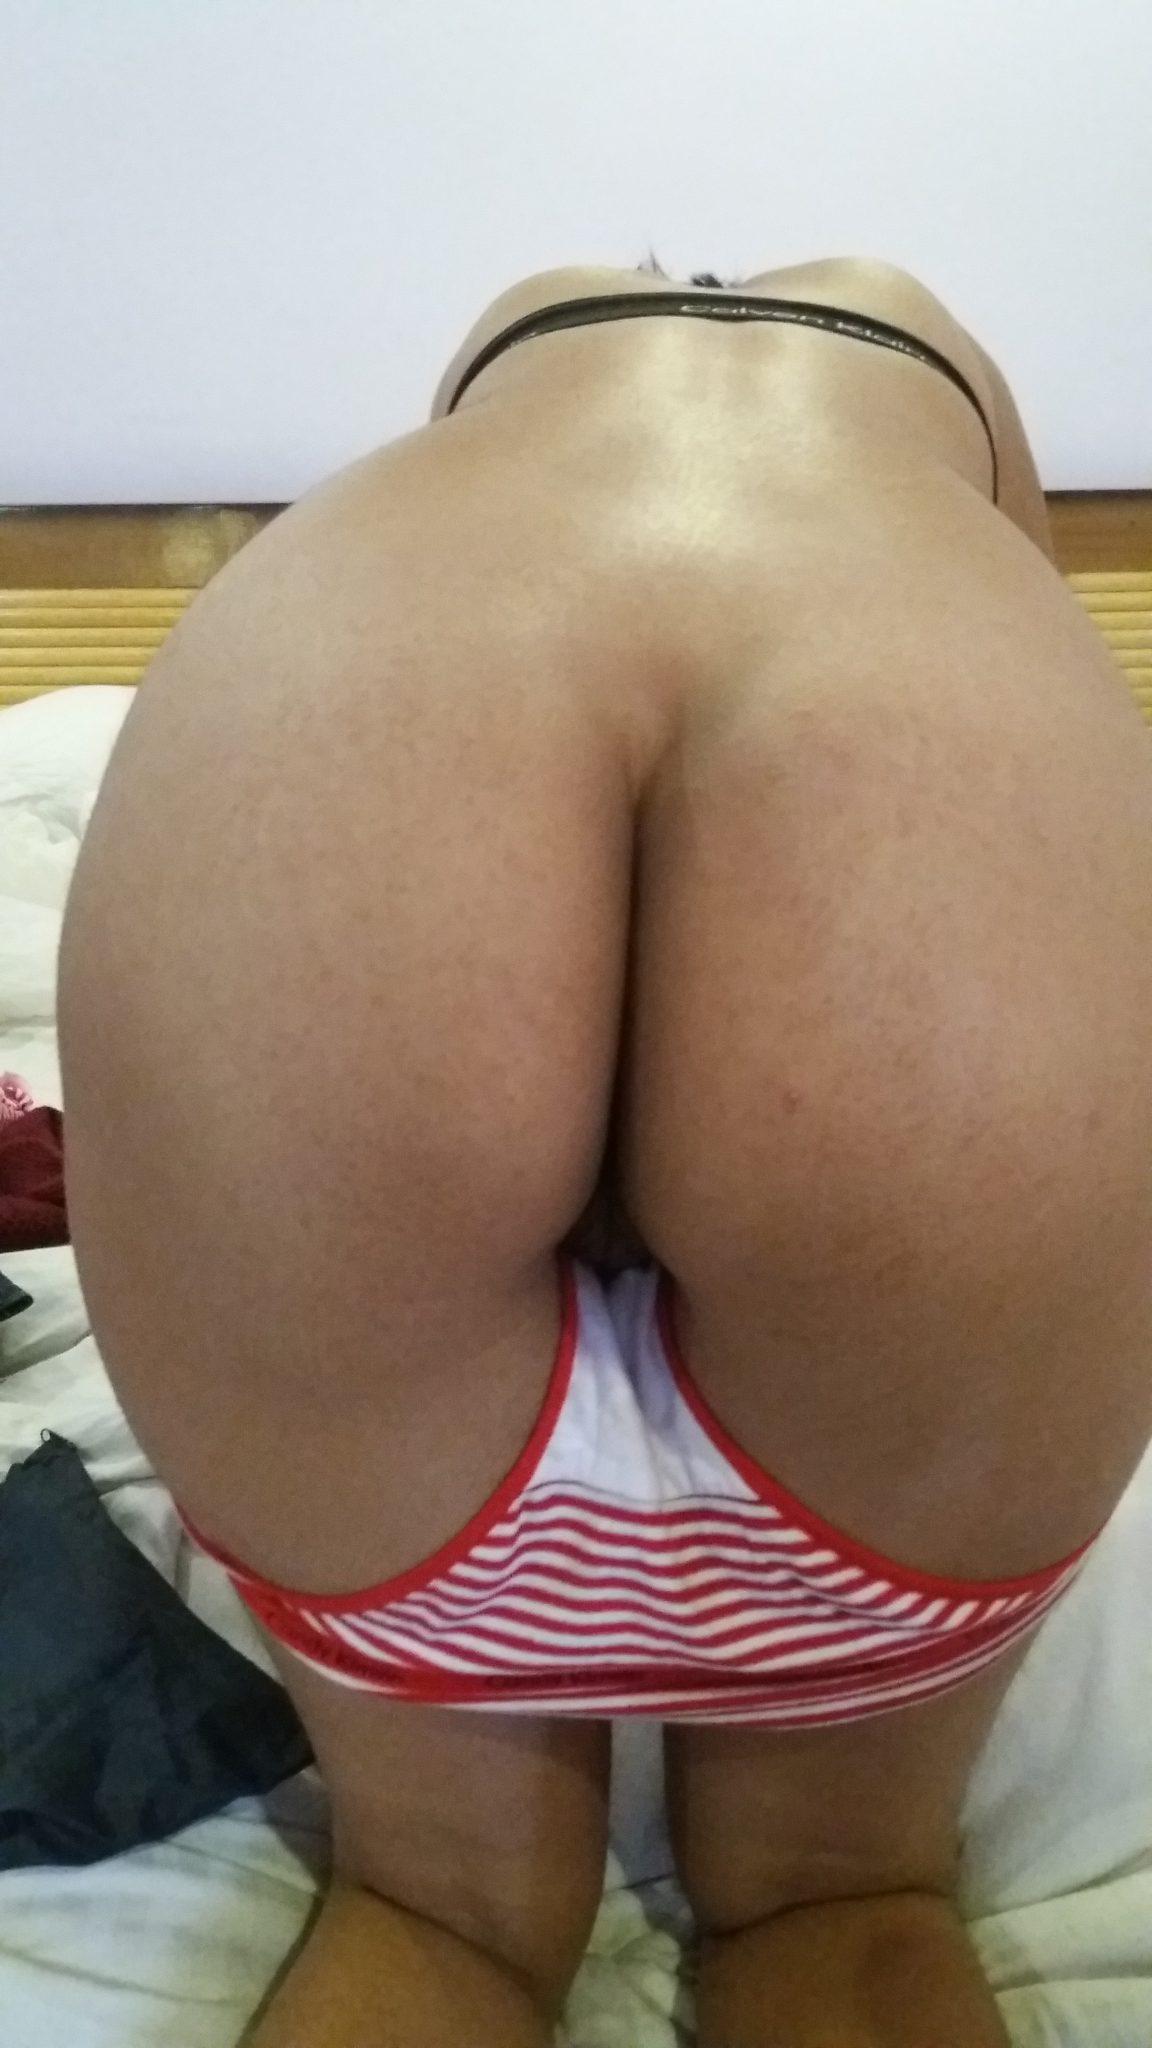 Hot Sexy Punjabi Girl Ramanpreet kaur Showing her Tight Pussy & Ass